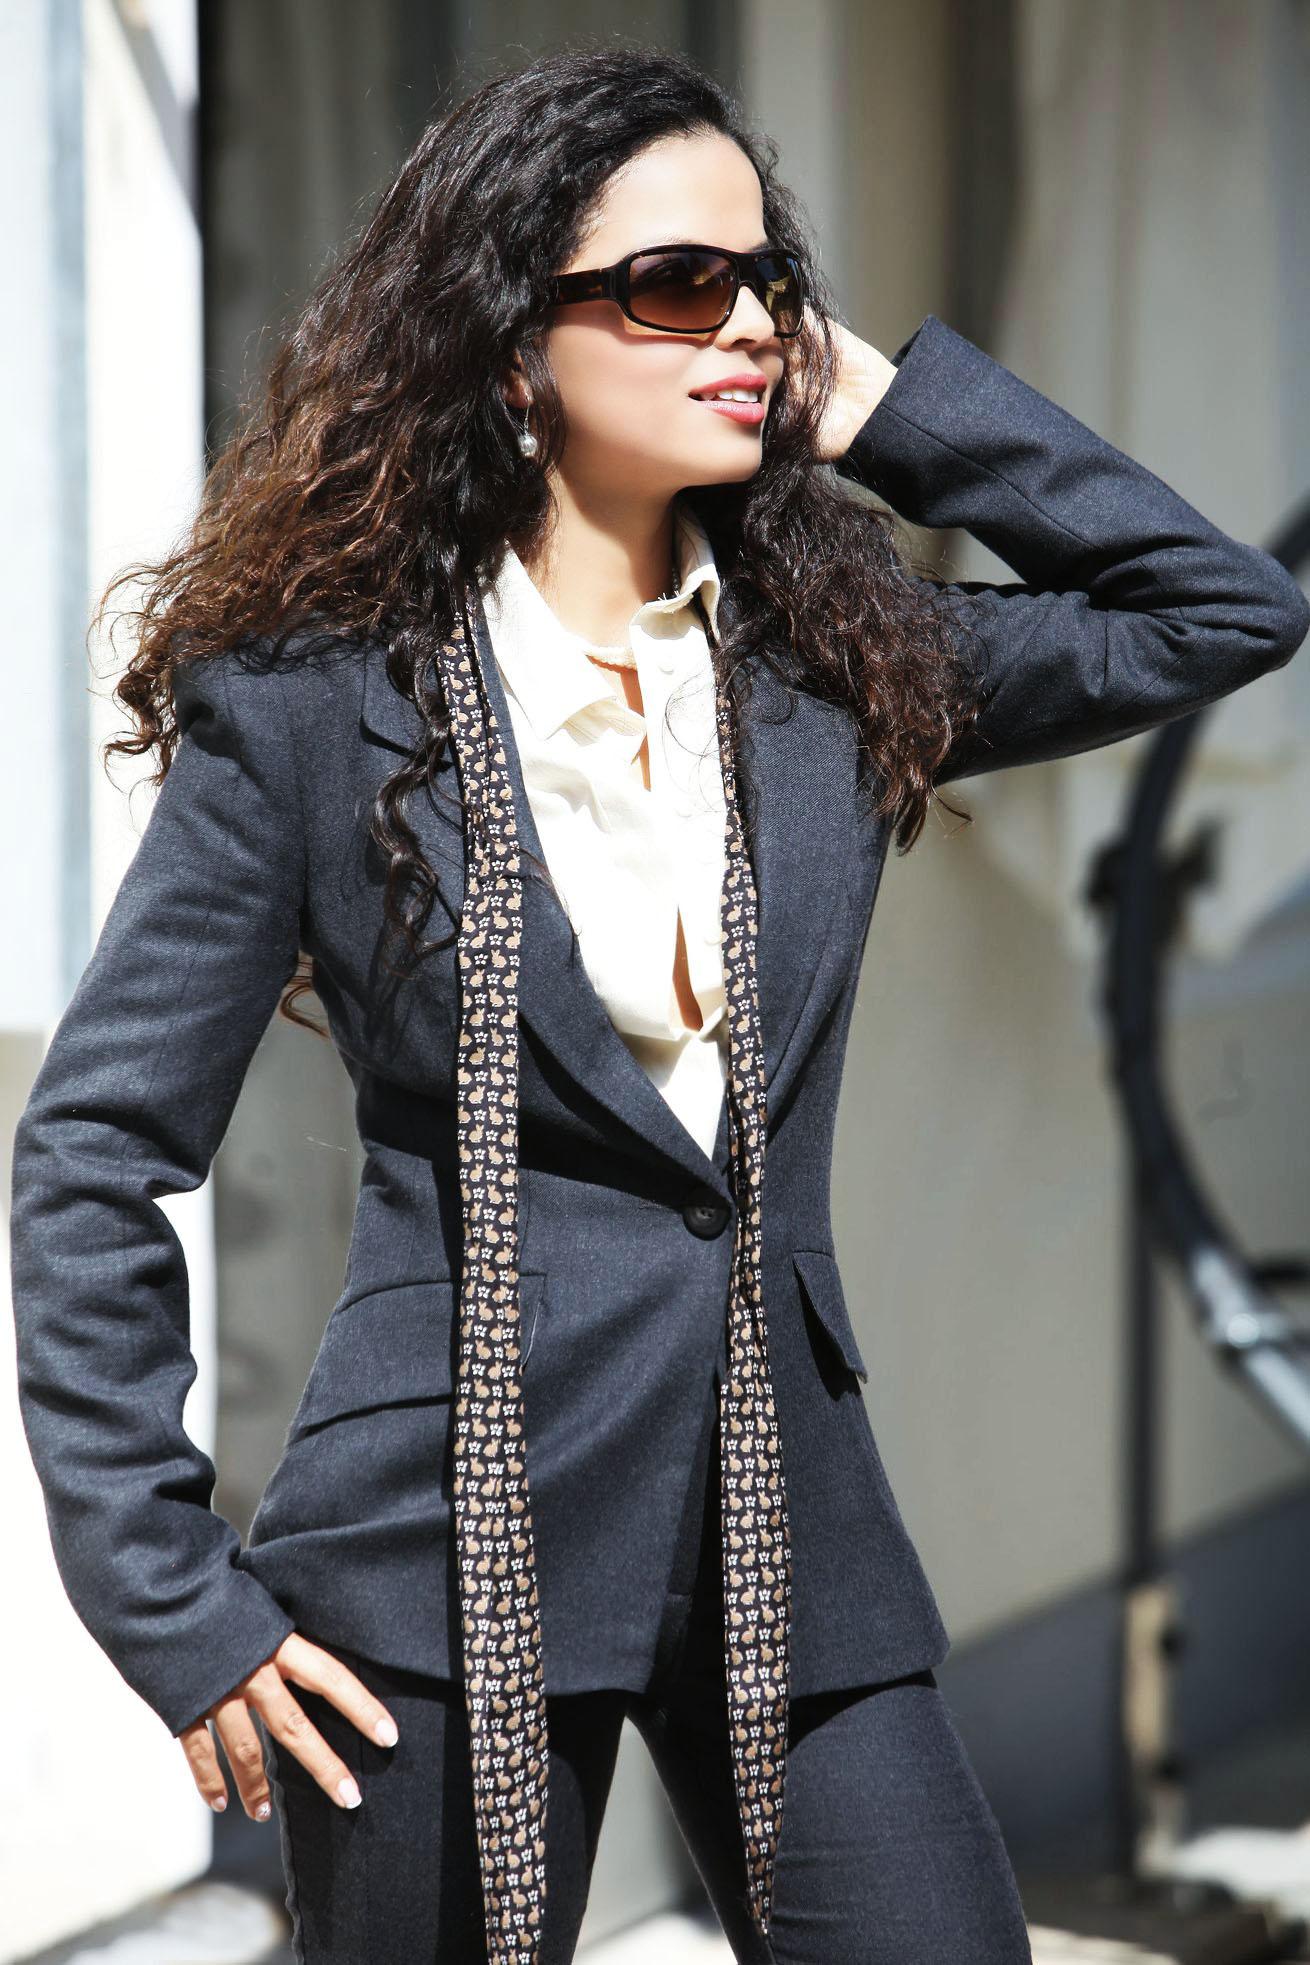 Miss Marcela Geschäftsfrau